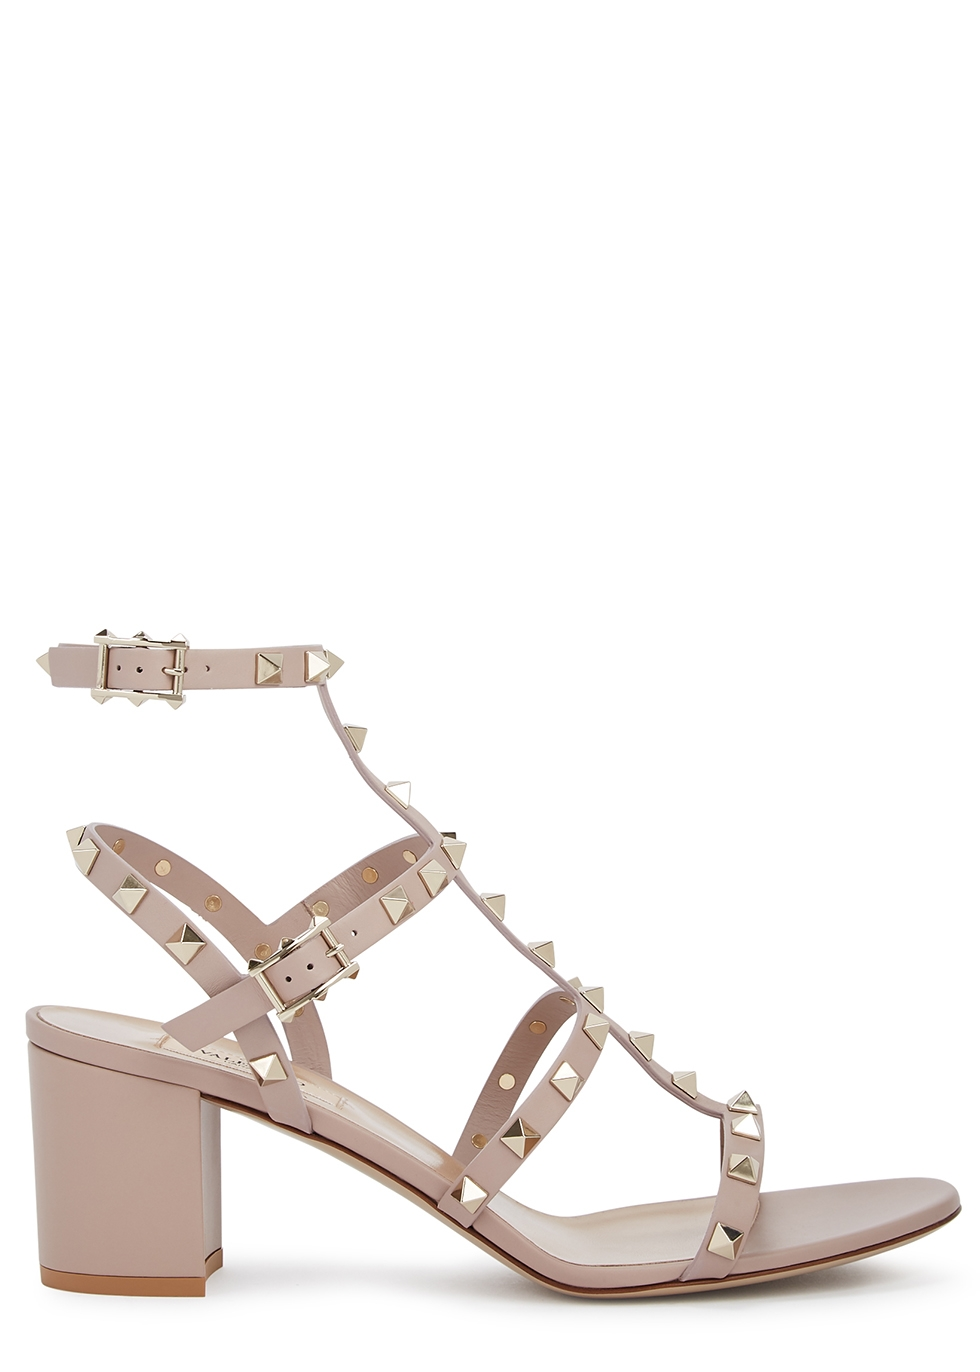 Designer Mid-Heel Sandals - Harvey Nichols